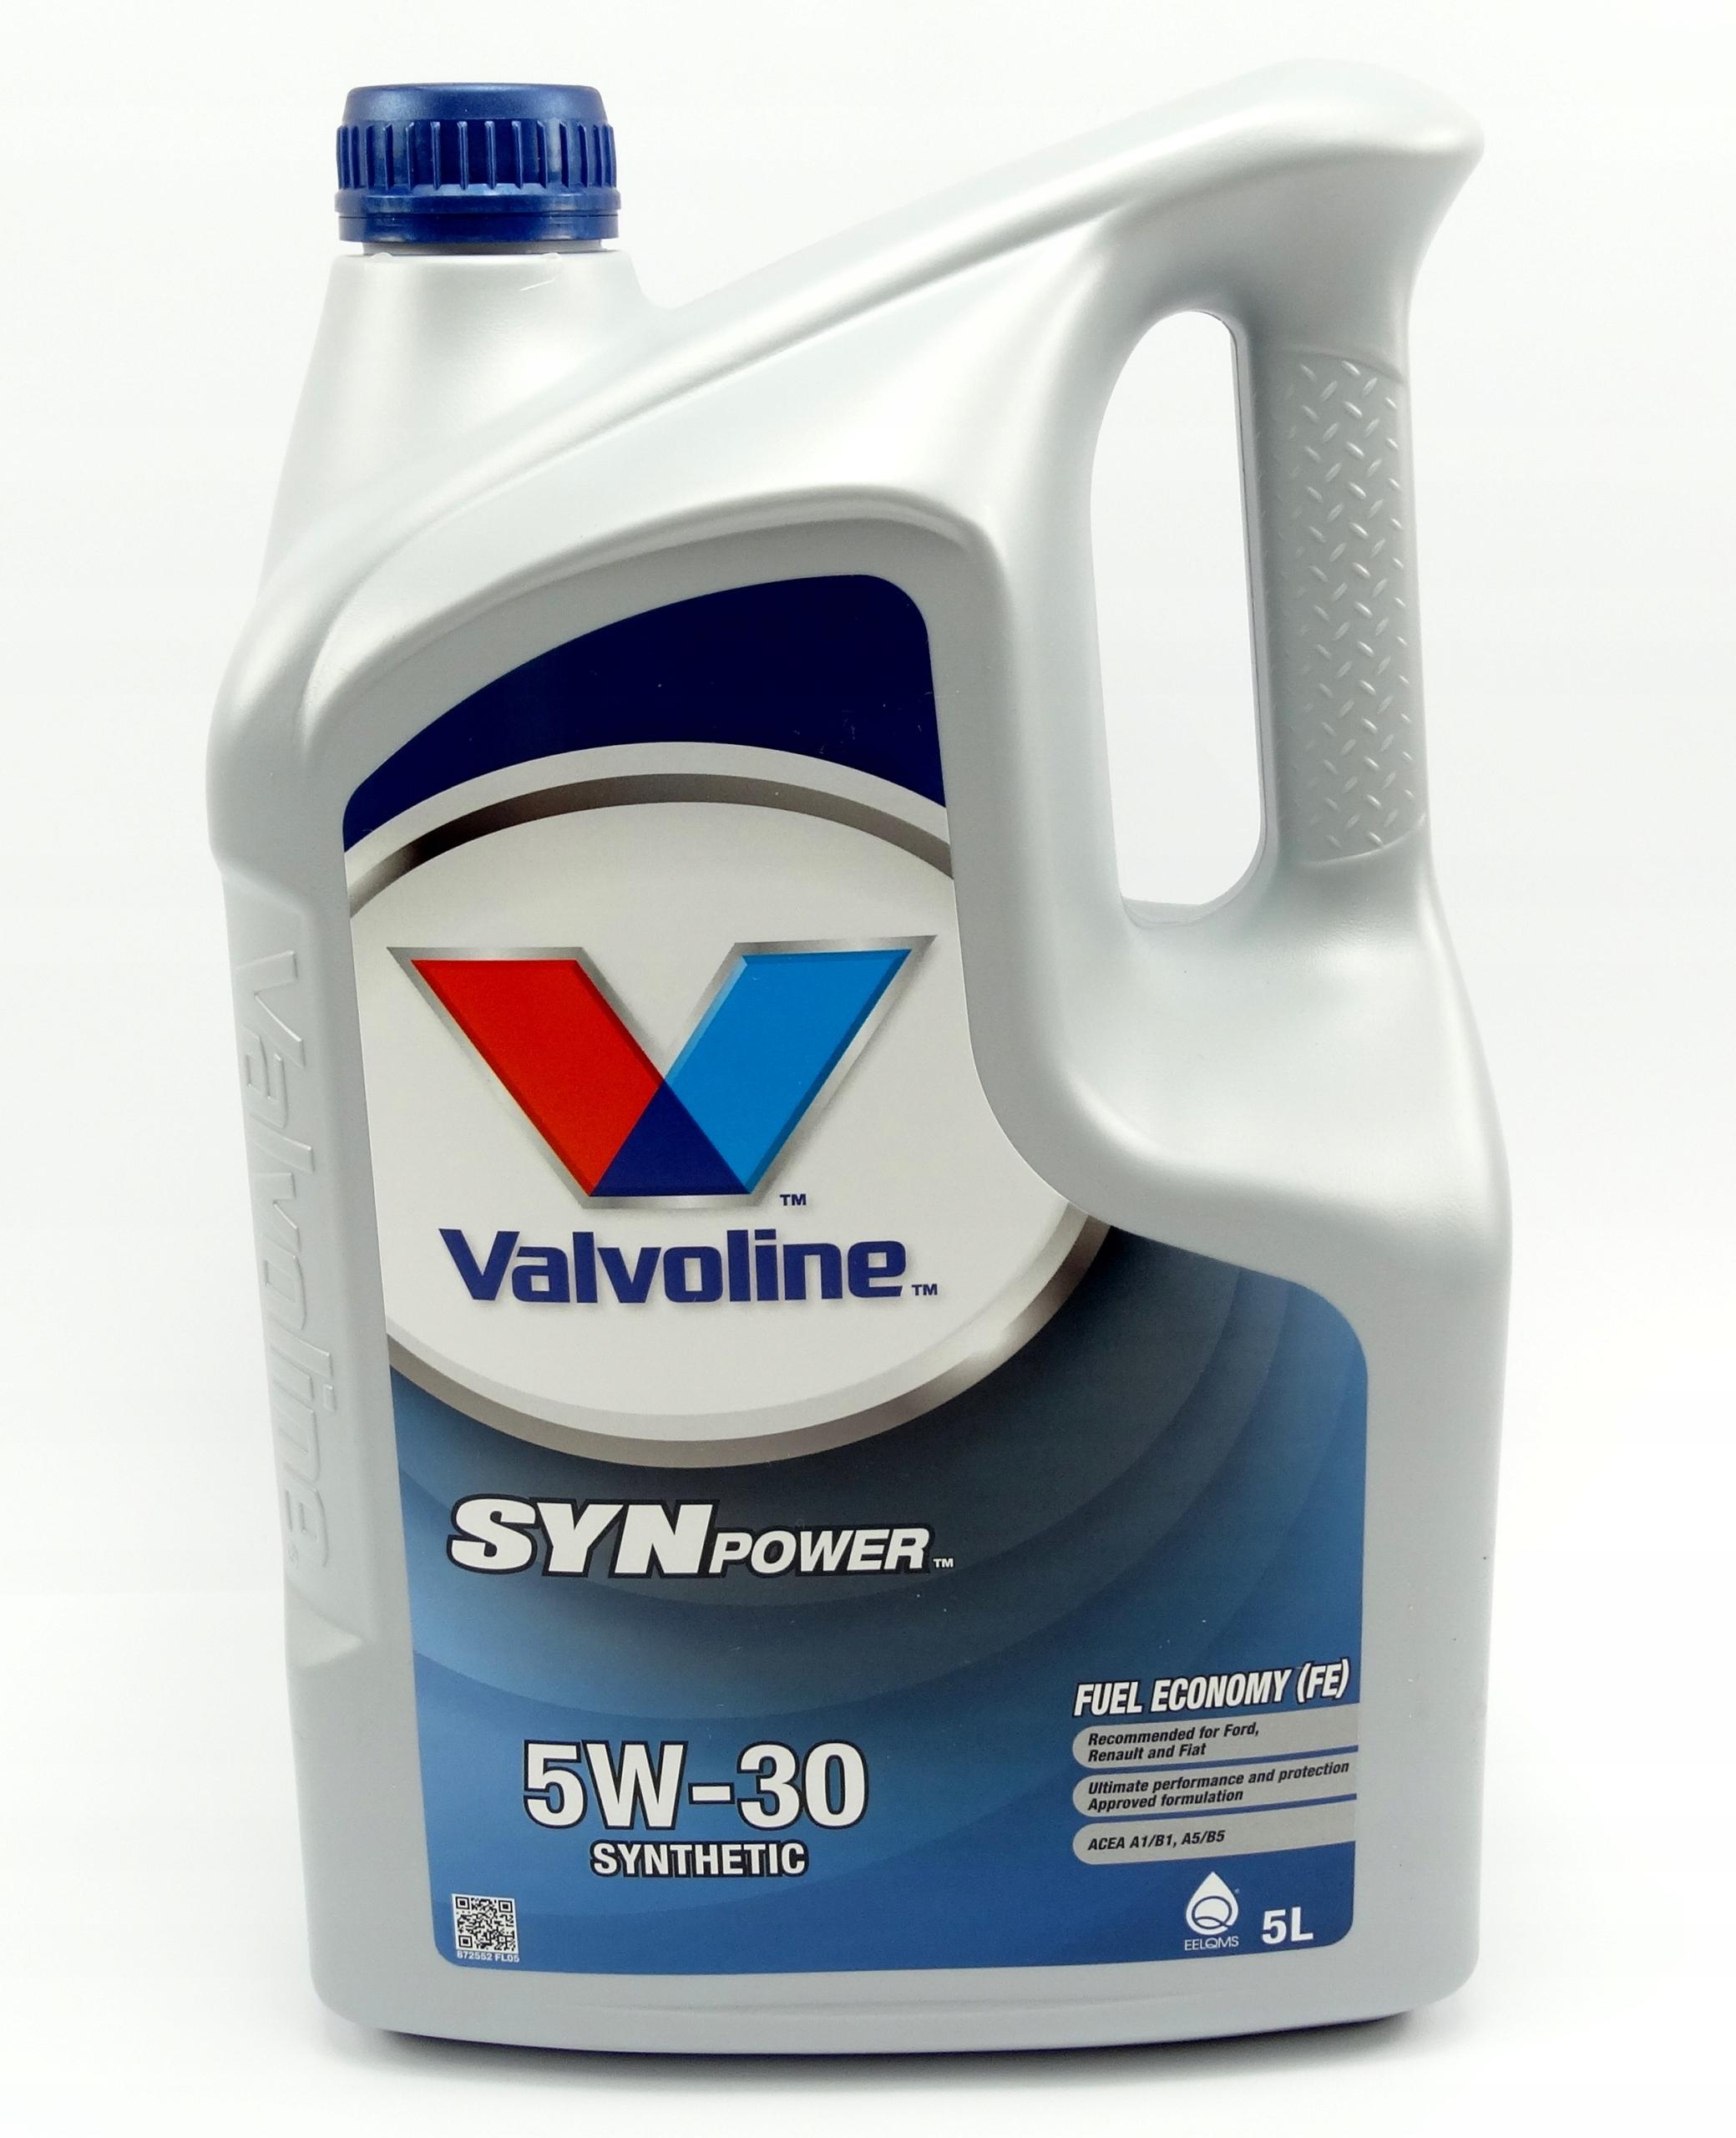 VALVOLINE SYNPOWER FE 5W30 Ford 913D A5 B5 5L